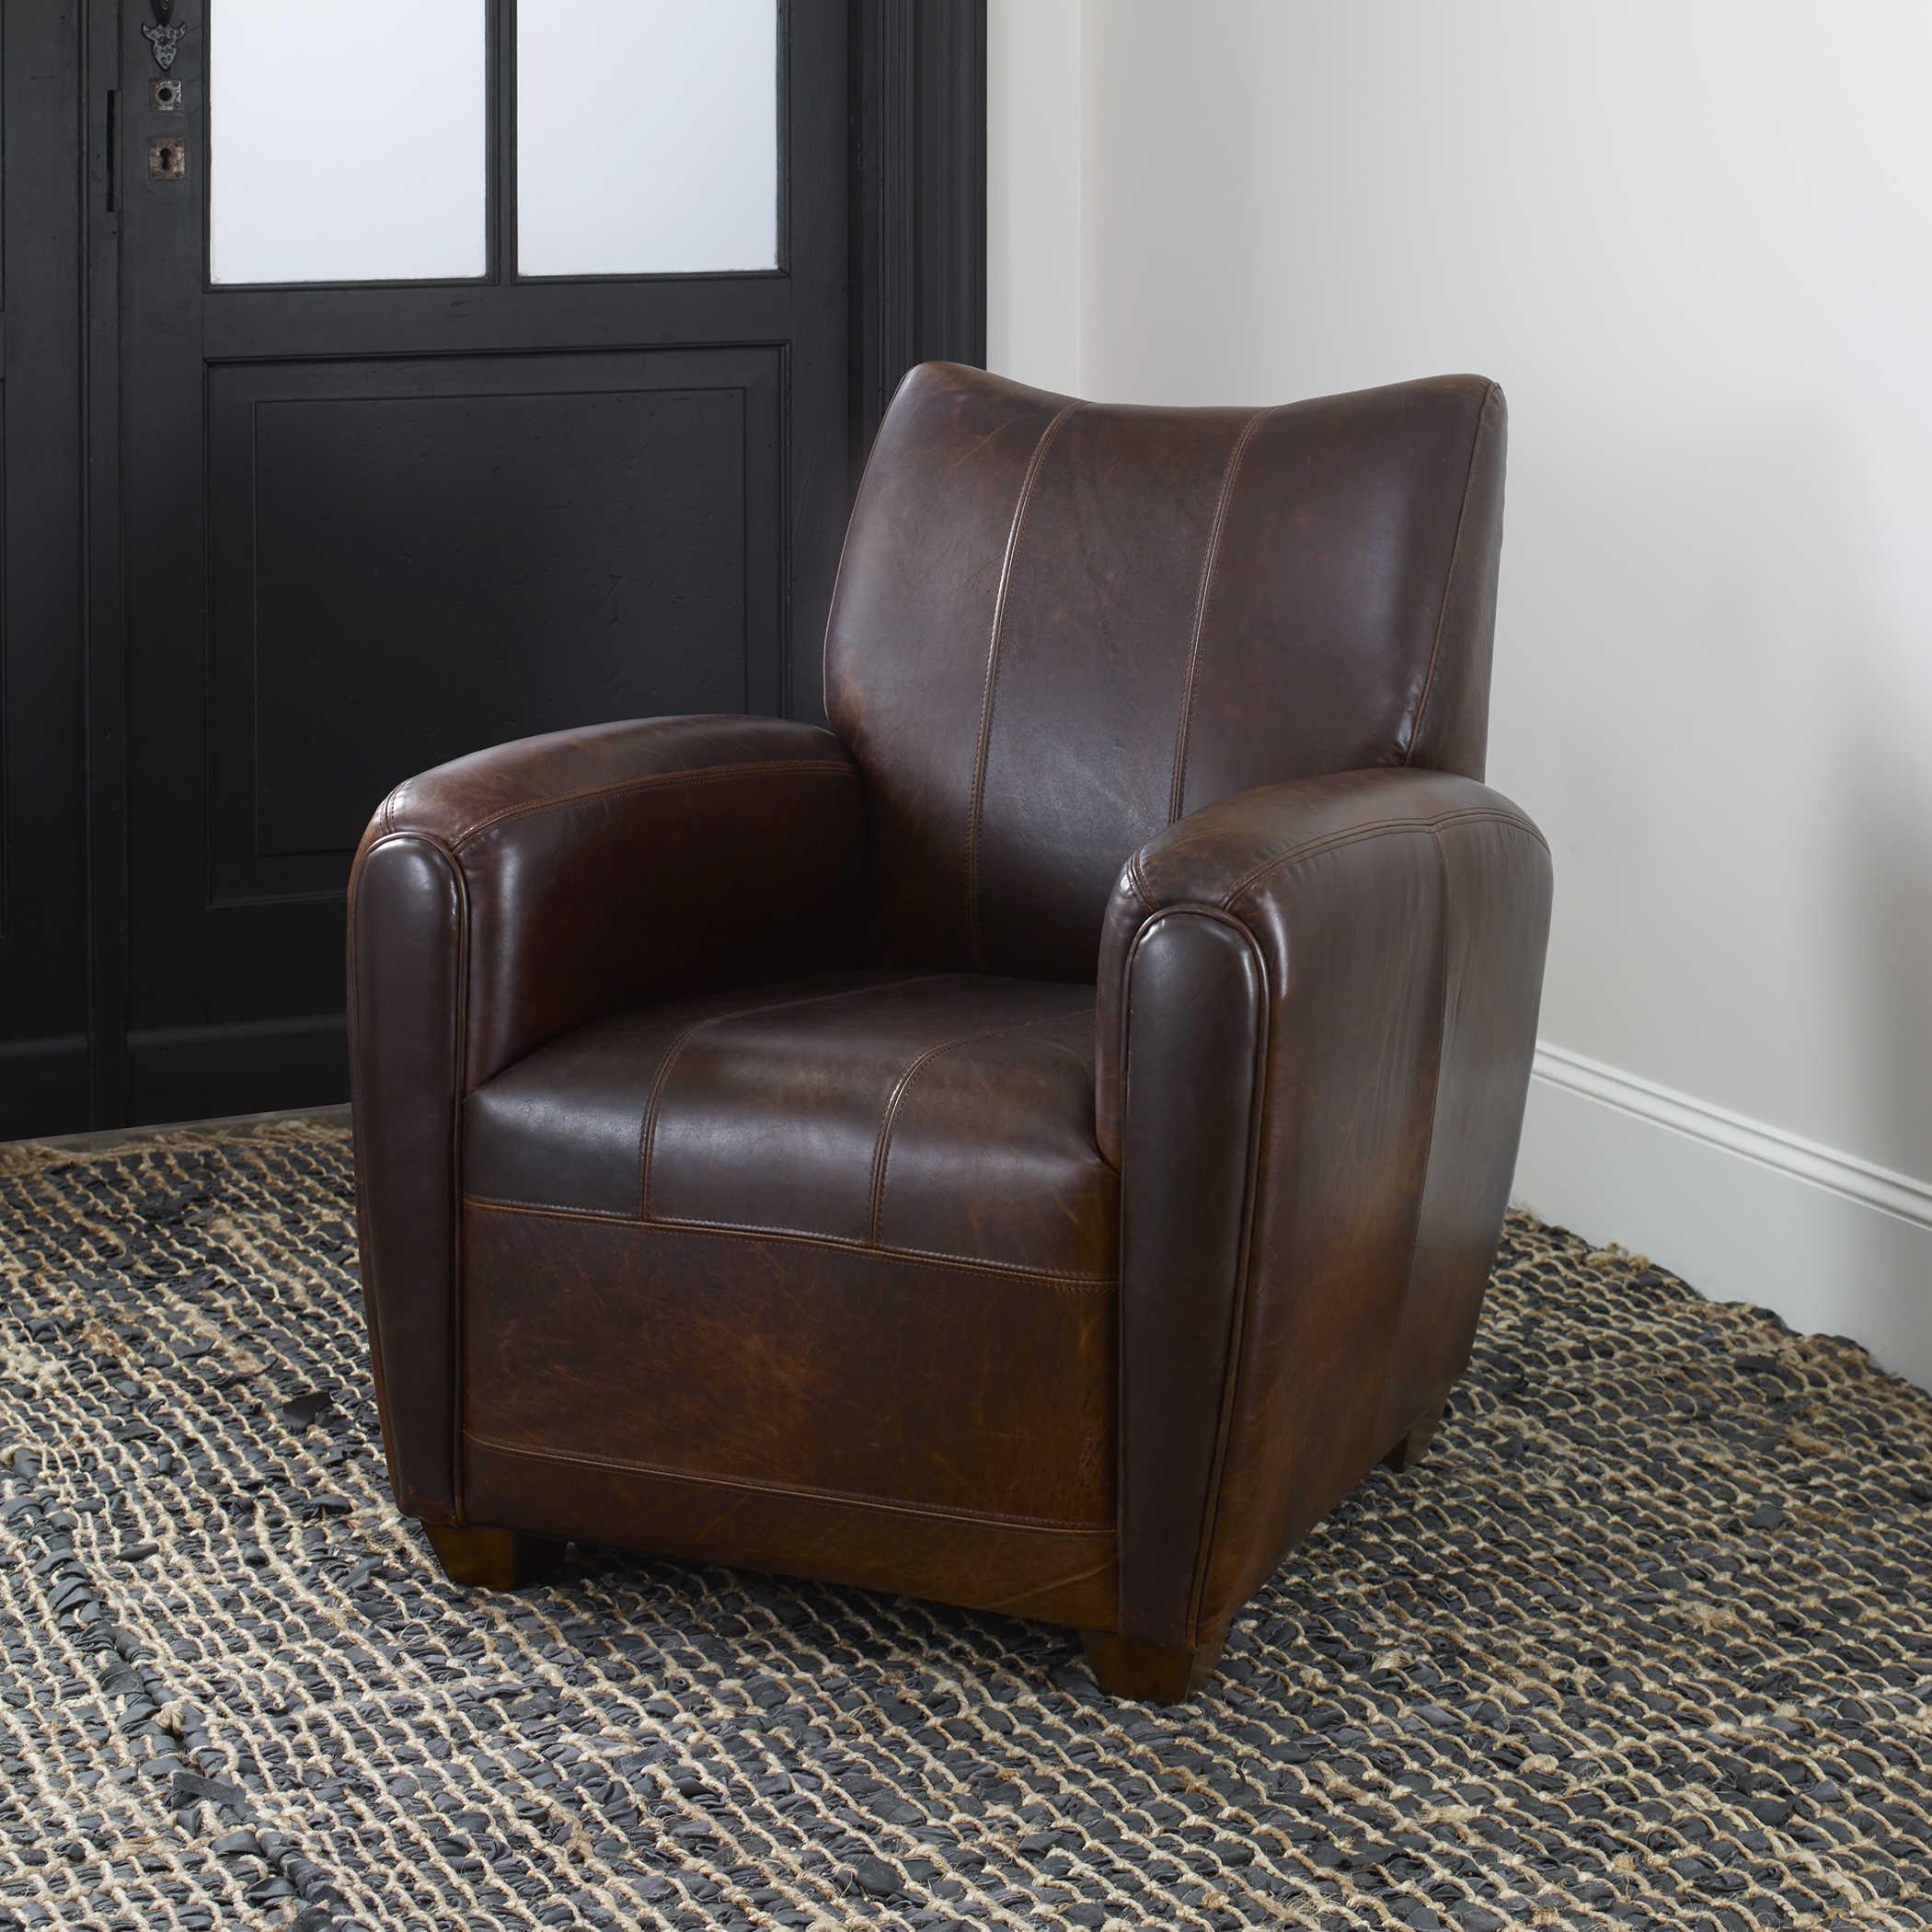 Booker Accent Chair Uttermost